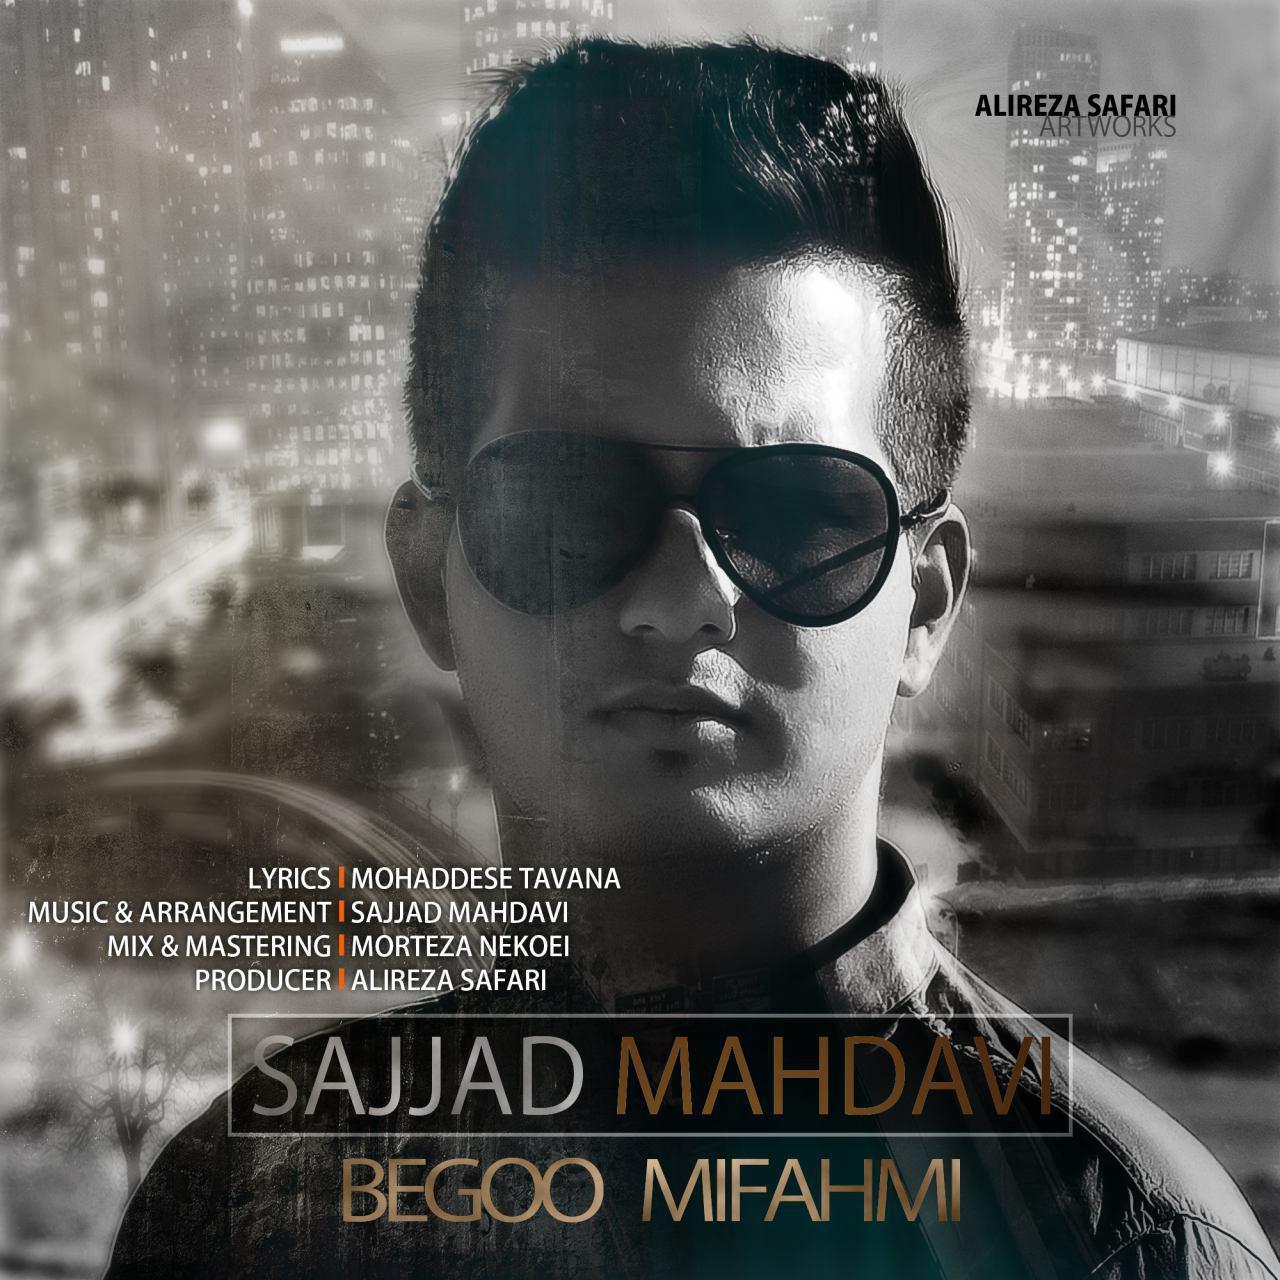 Sajjad Mahdavi – Begoo Mifahmi